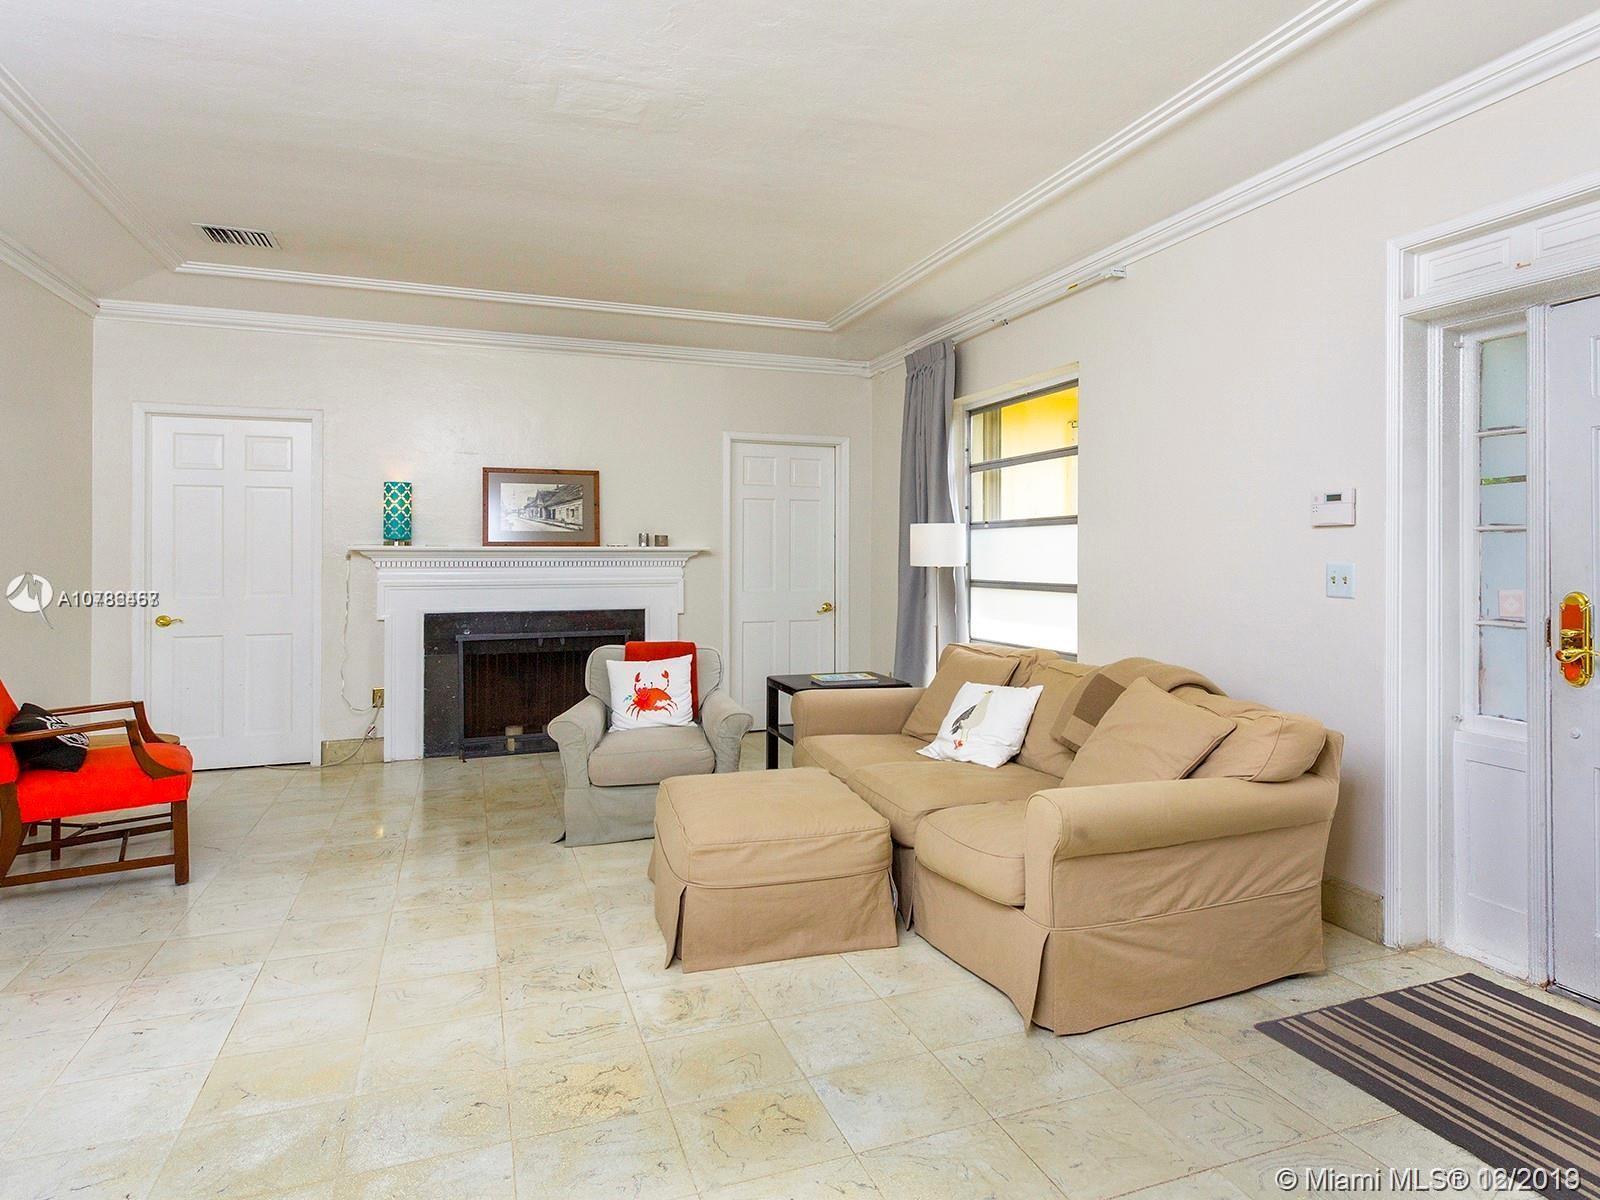 Дом в США по адресу 9400 Abbott Ave, Surfside, FL 33154